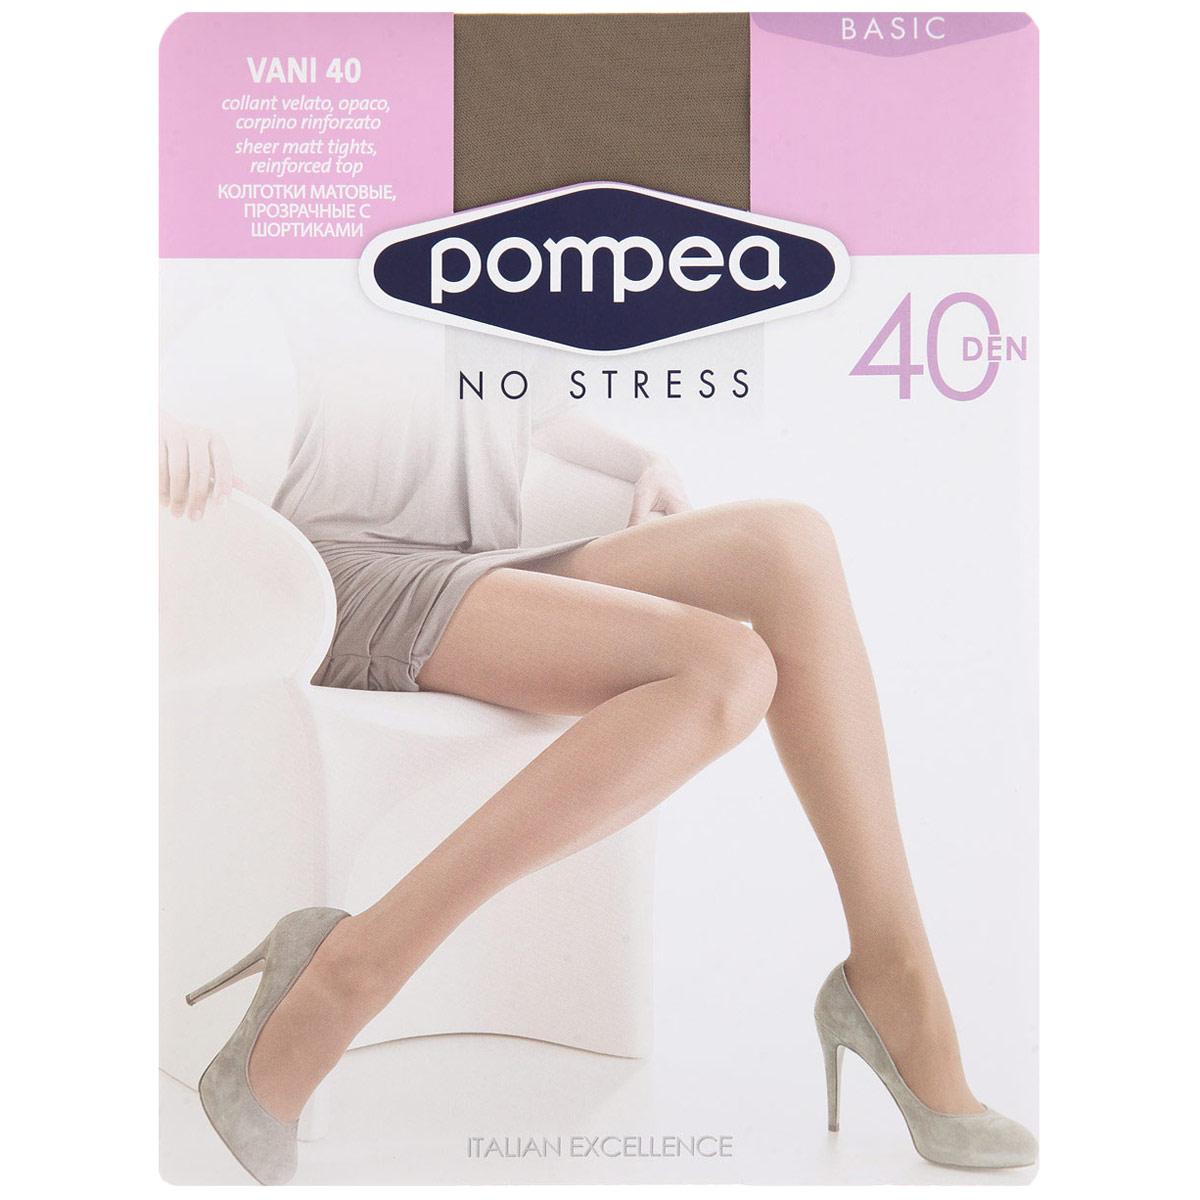 Колготки женские Pompea Vani 40, цвет: Nature (цвет загара). 720480. Размер 5 (XL) гольфы pompea гольфы vani 20